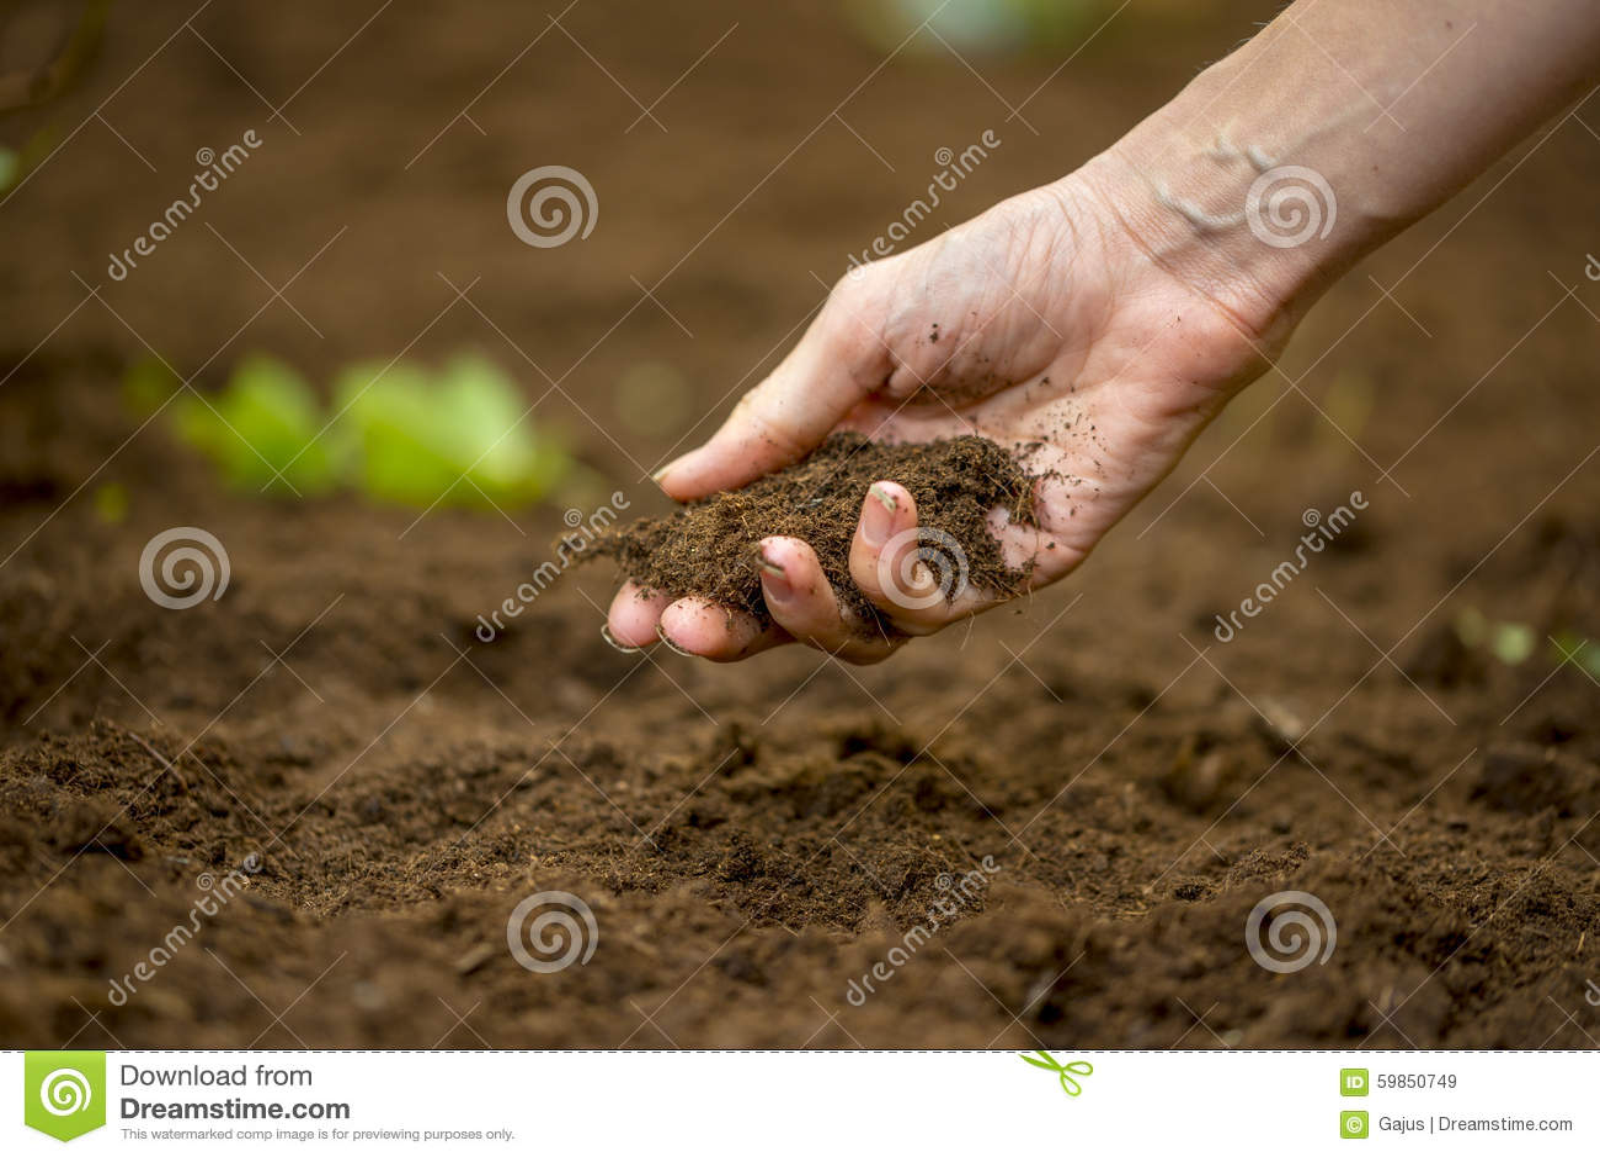 Woman holding a handful of rich fertile soil